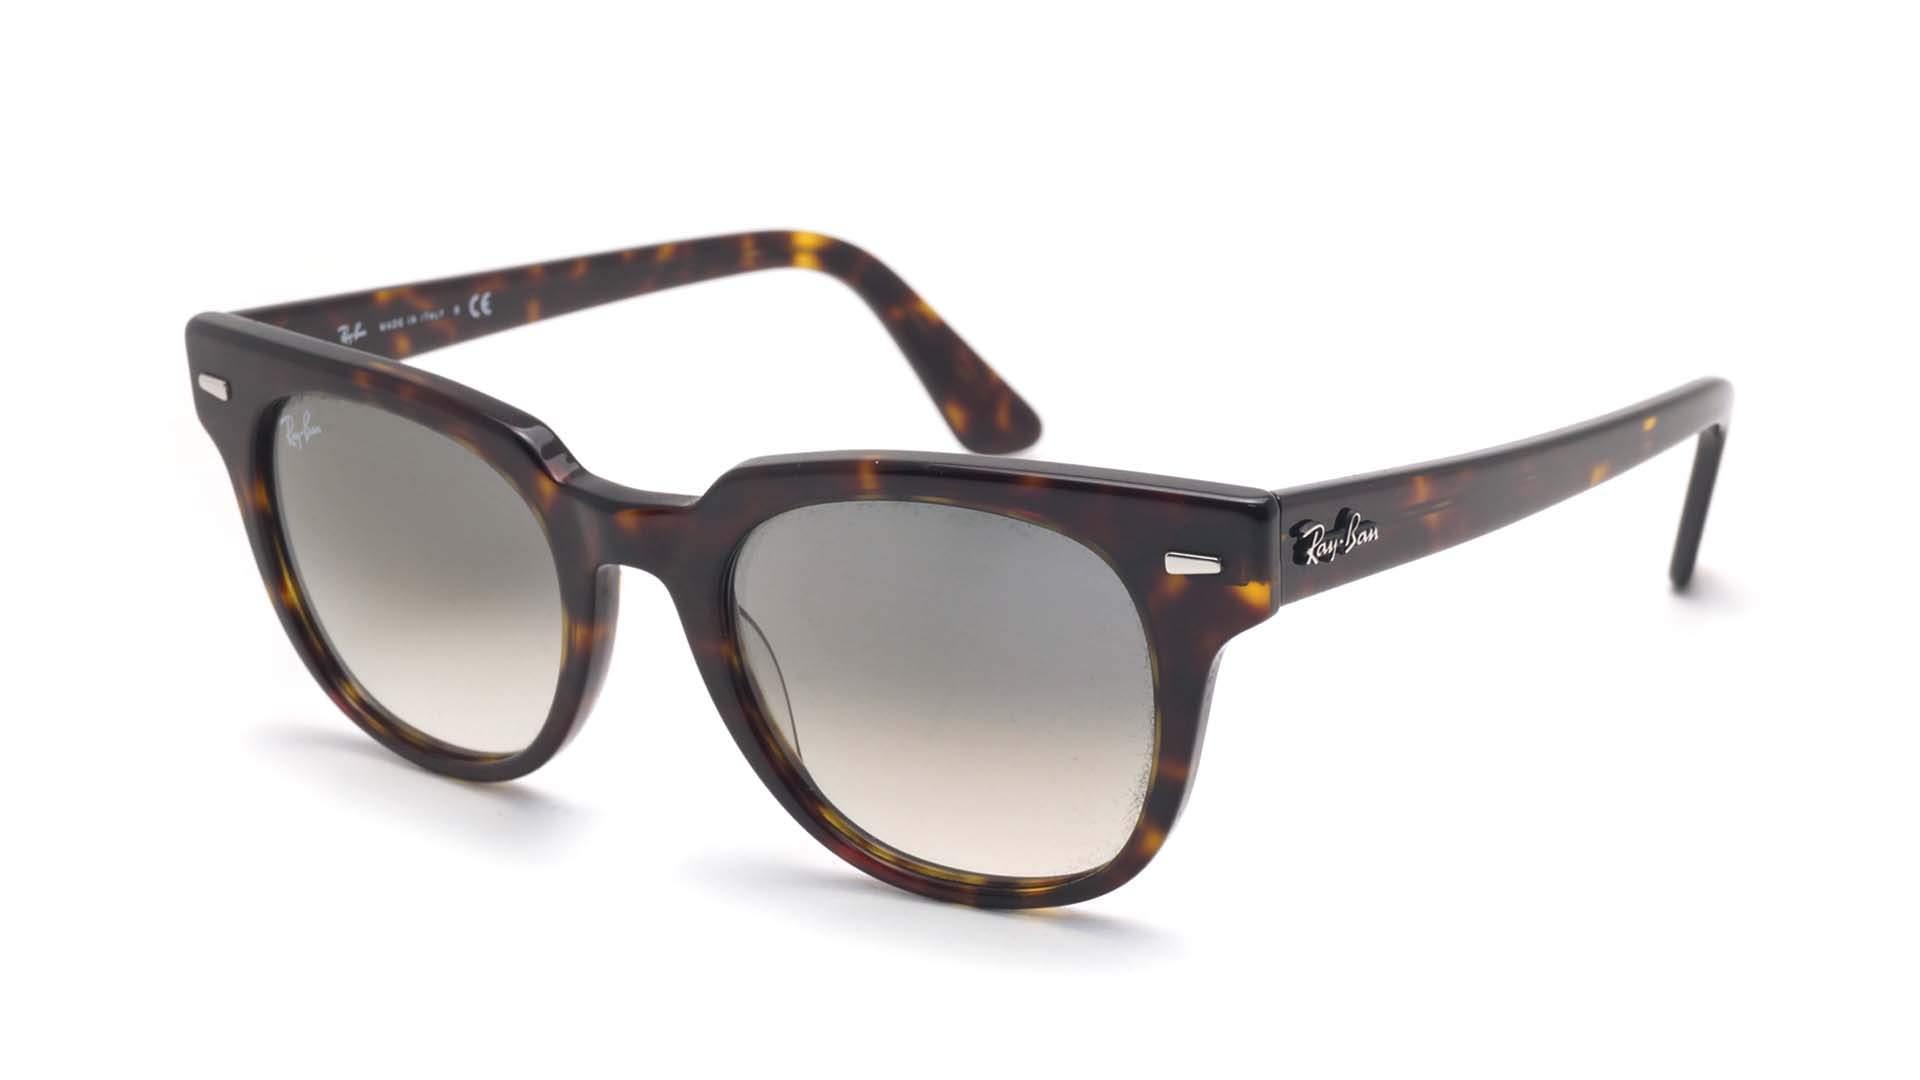 884dac5bb6 Sunglasses Ray-Ban Meteor Tortoise RB2168 902 32 50-20 Medium Gradient